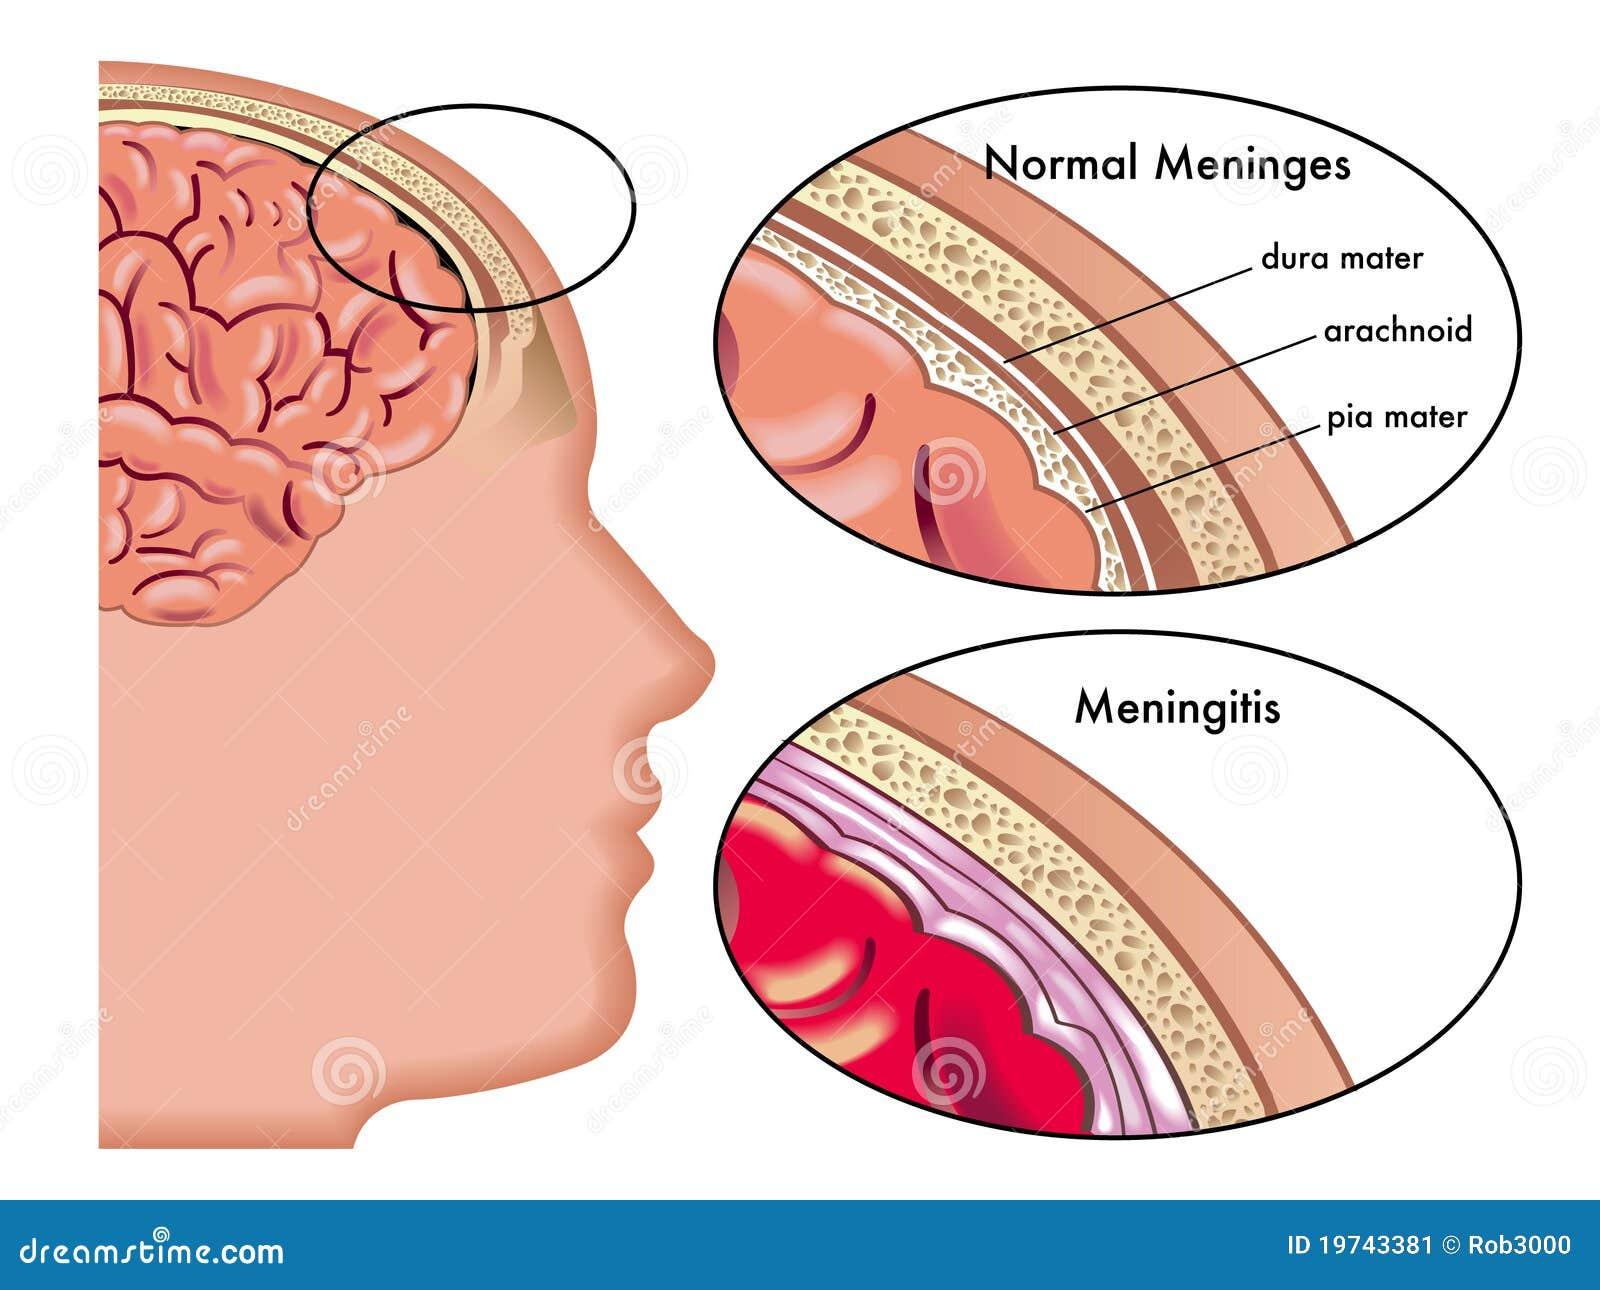 meningococcal meningitis causes and diagnosis